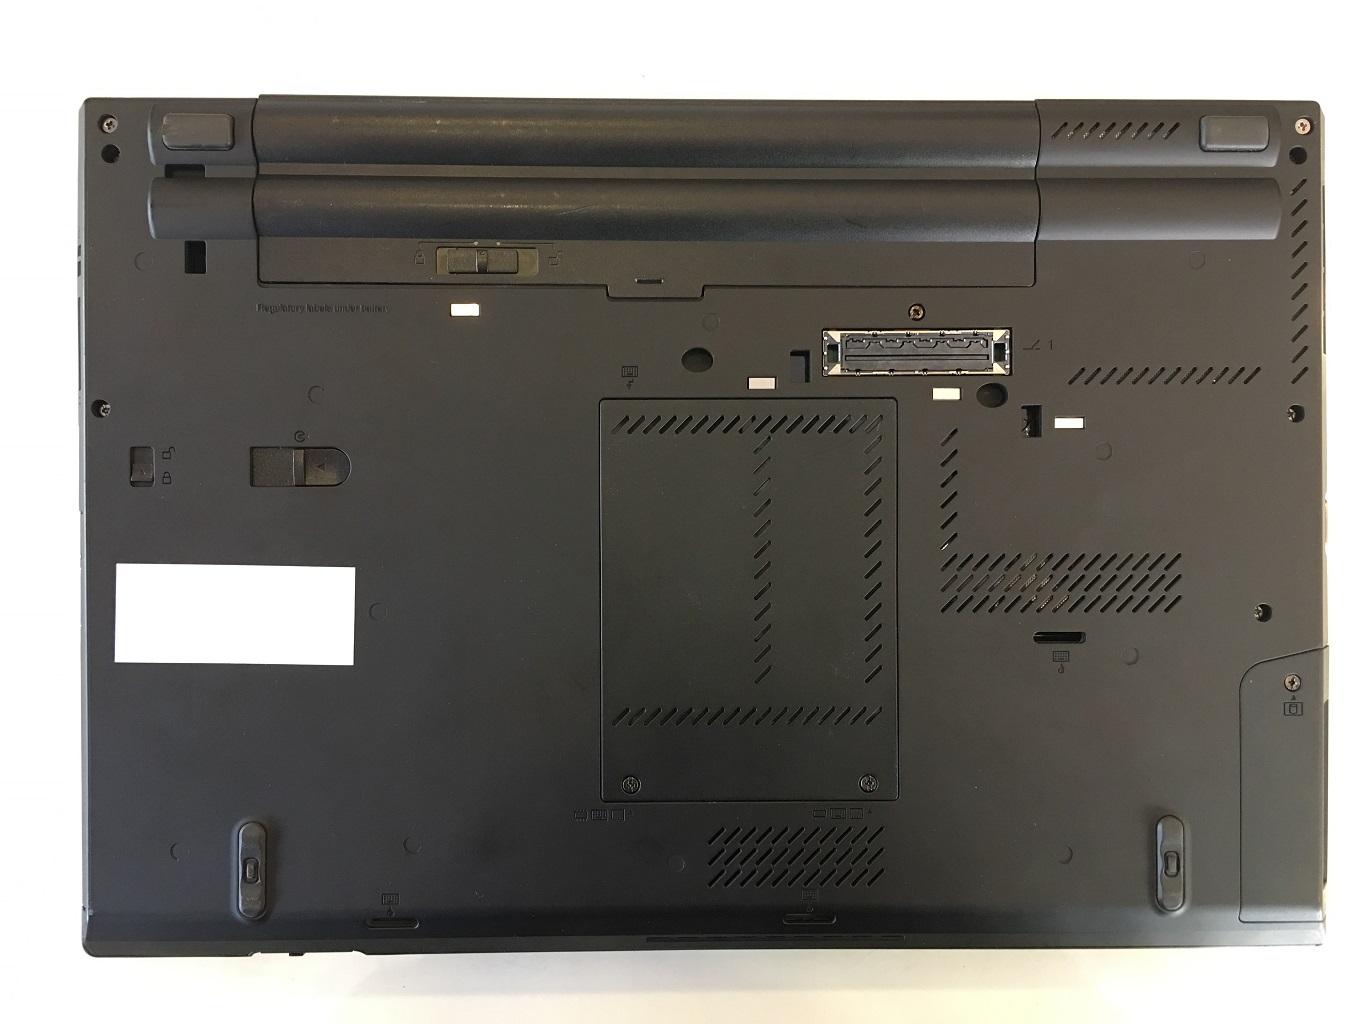 HP EliteBook 8470p vs Dell Latitude E6430 vs Lenovo ThinkPad T430 teszt